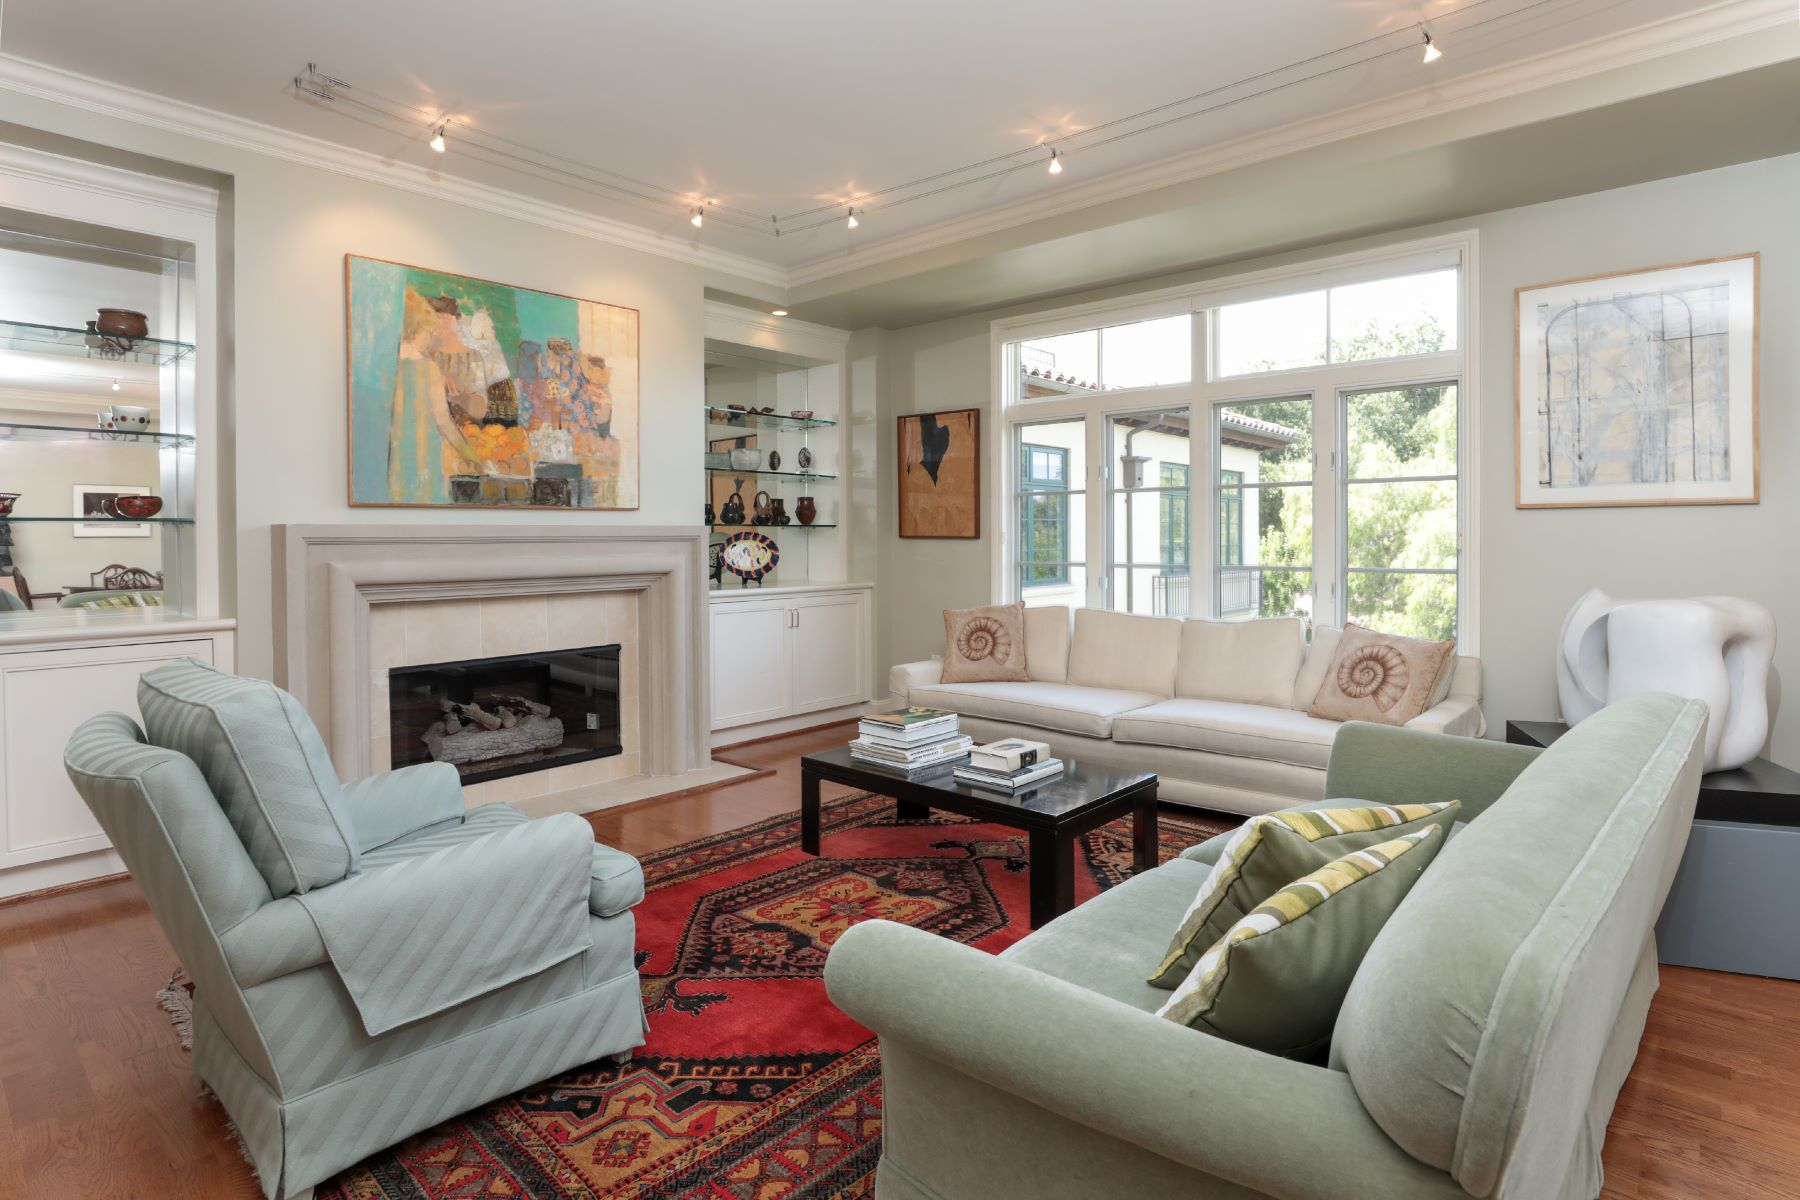 Condominiums for Sale at Prime Downtown PA Condo 555 Byron St #303 Palo Alto, California 94301 United States